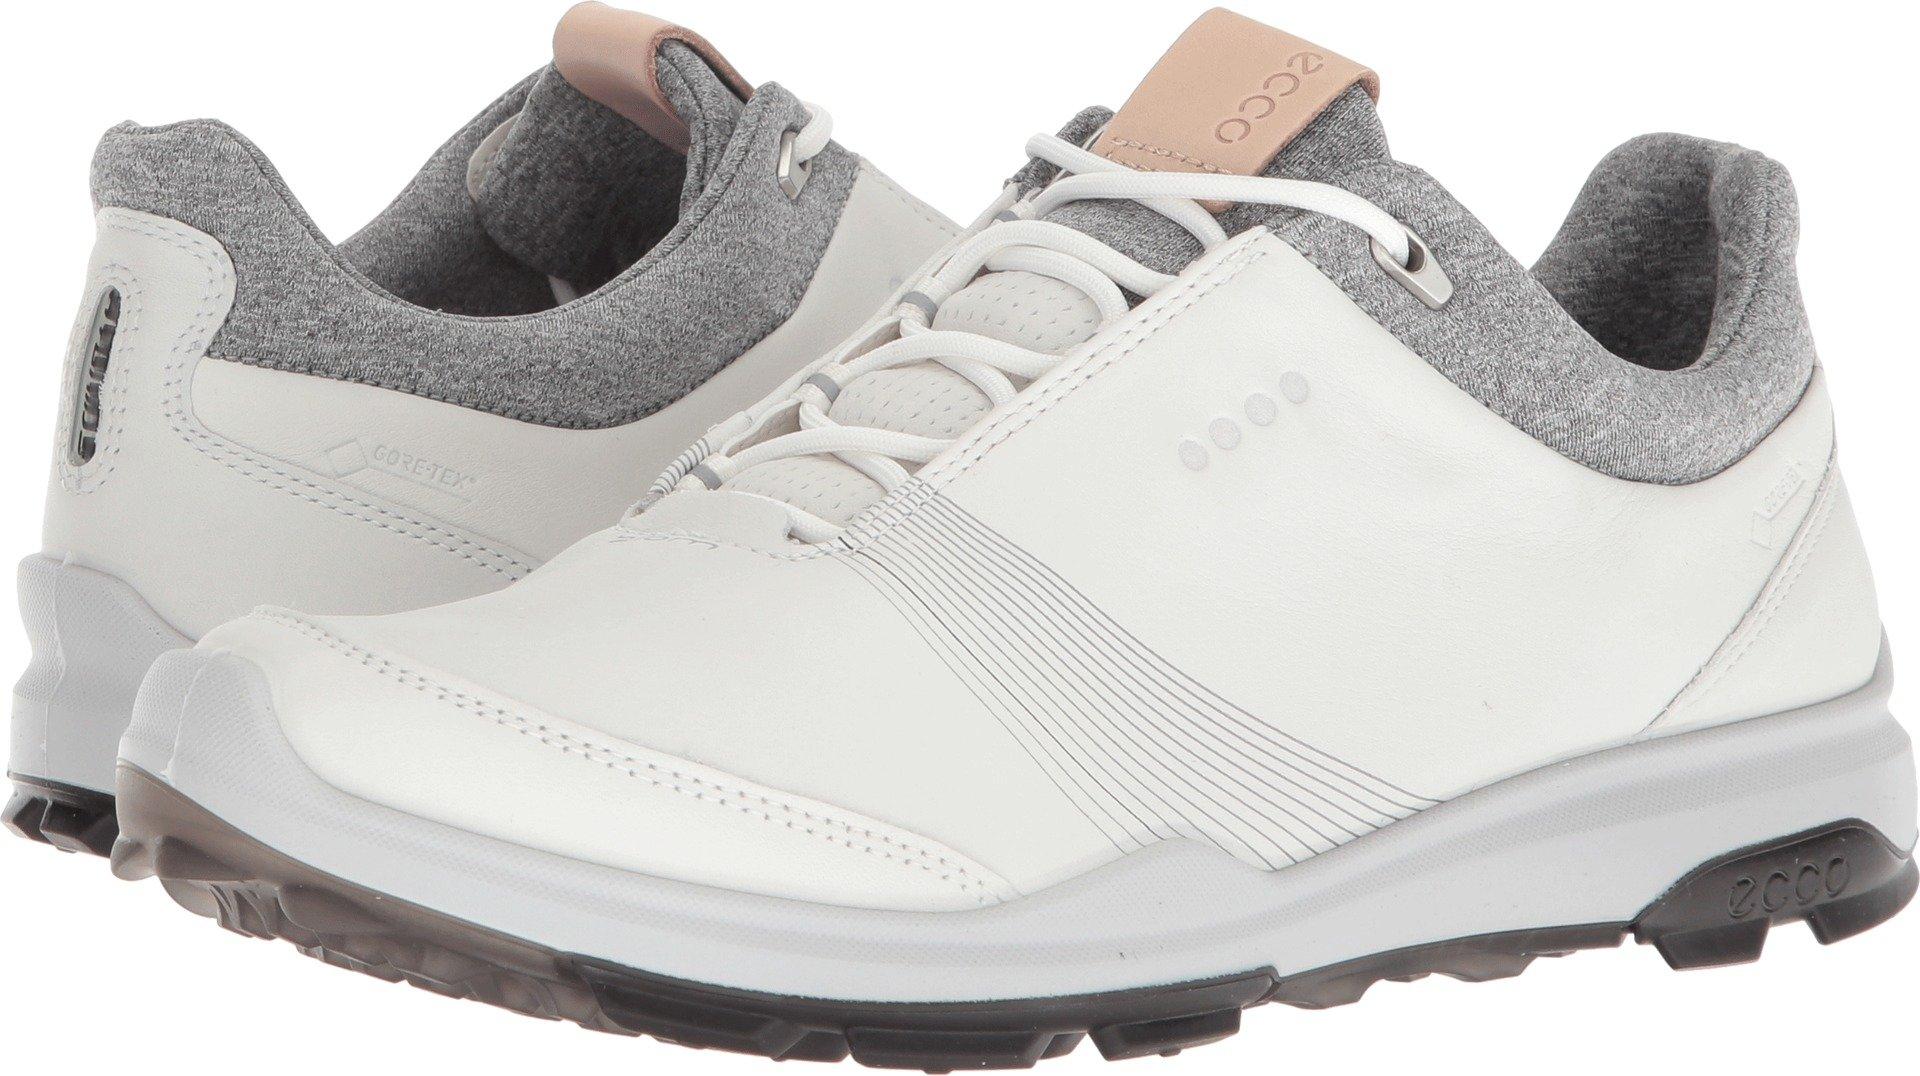 ECCO Women's Biom Hybrid 3 Gore-Tex Golf Shoe, White/Black Yak Leather, 7 M US by ECCO